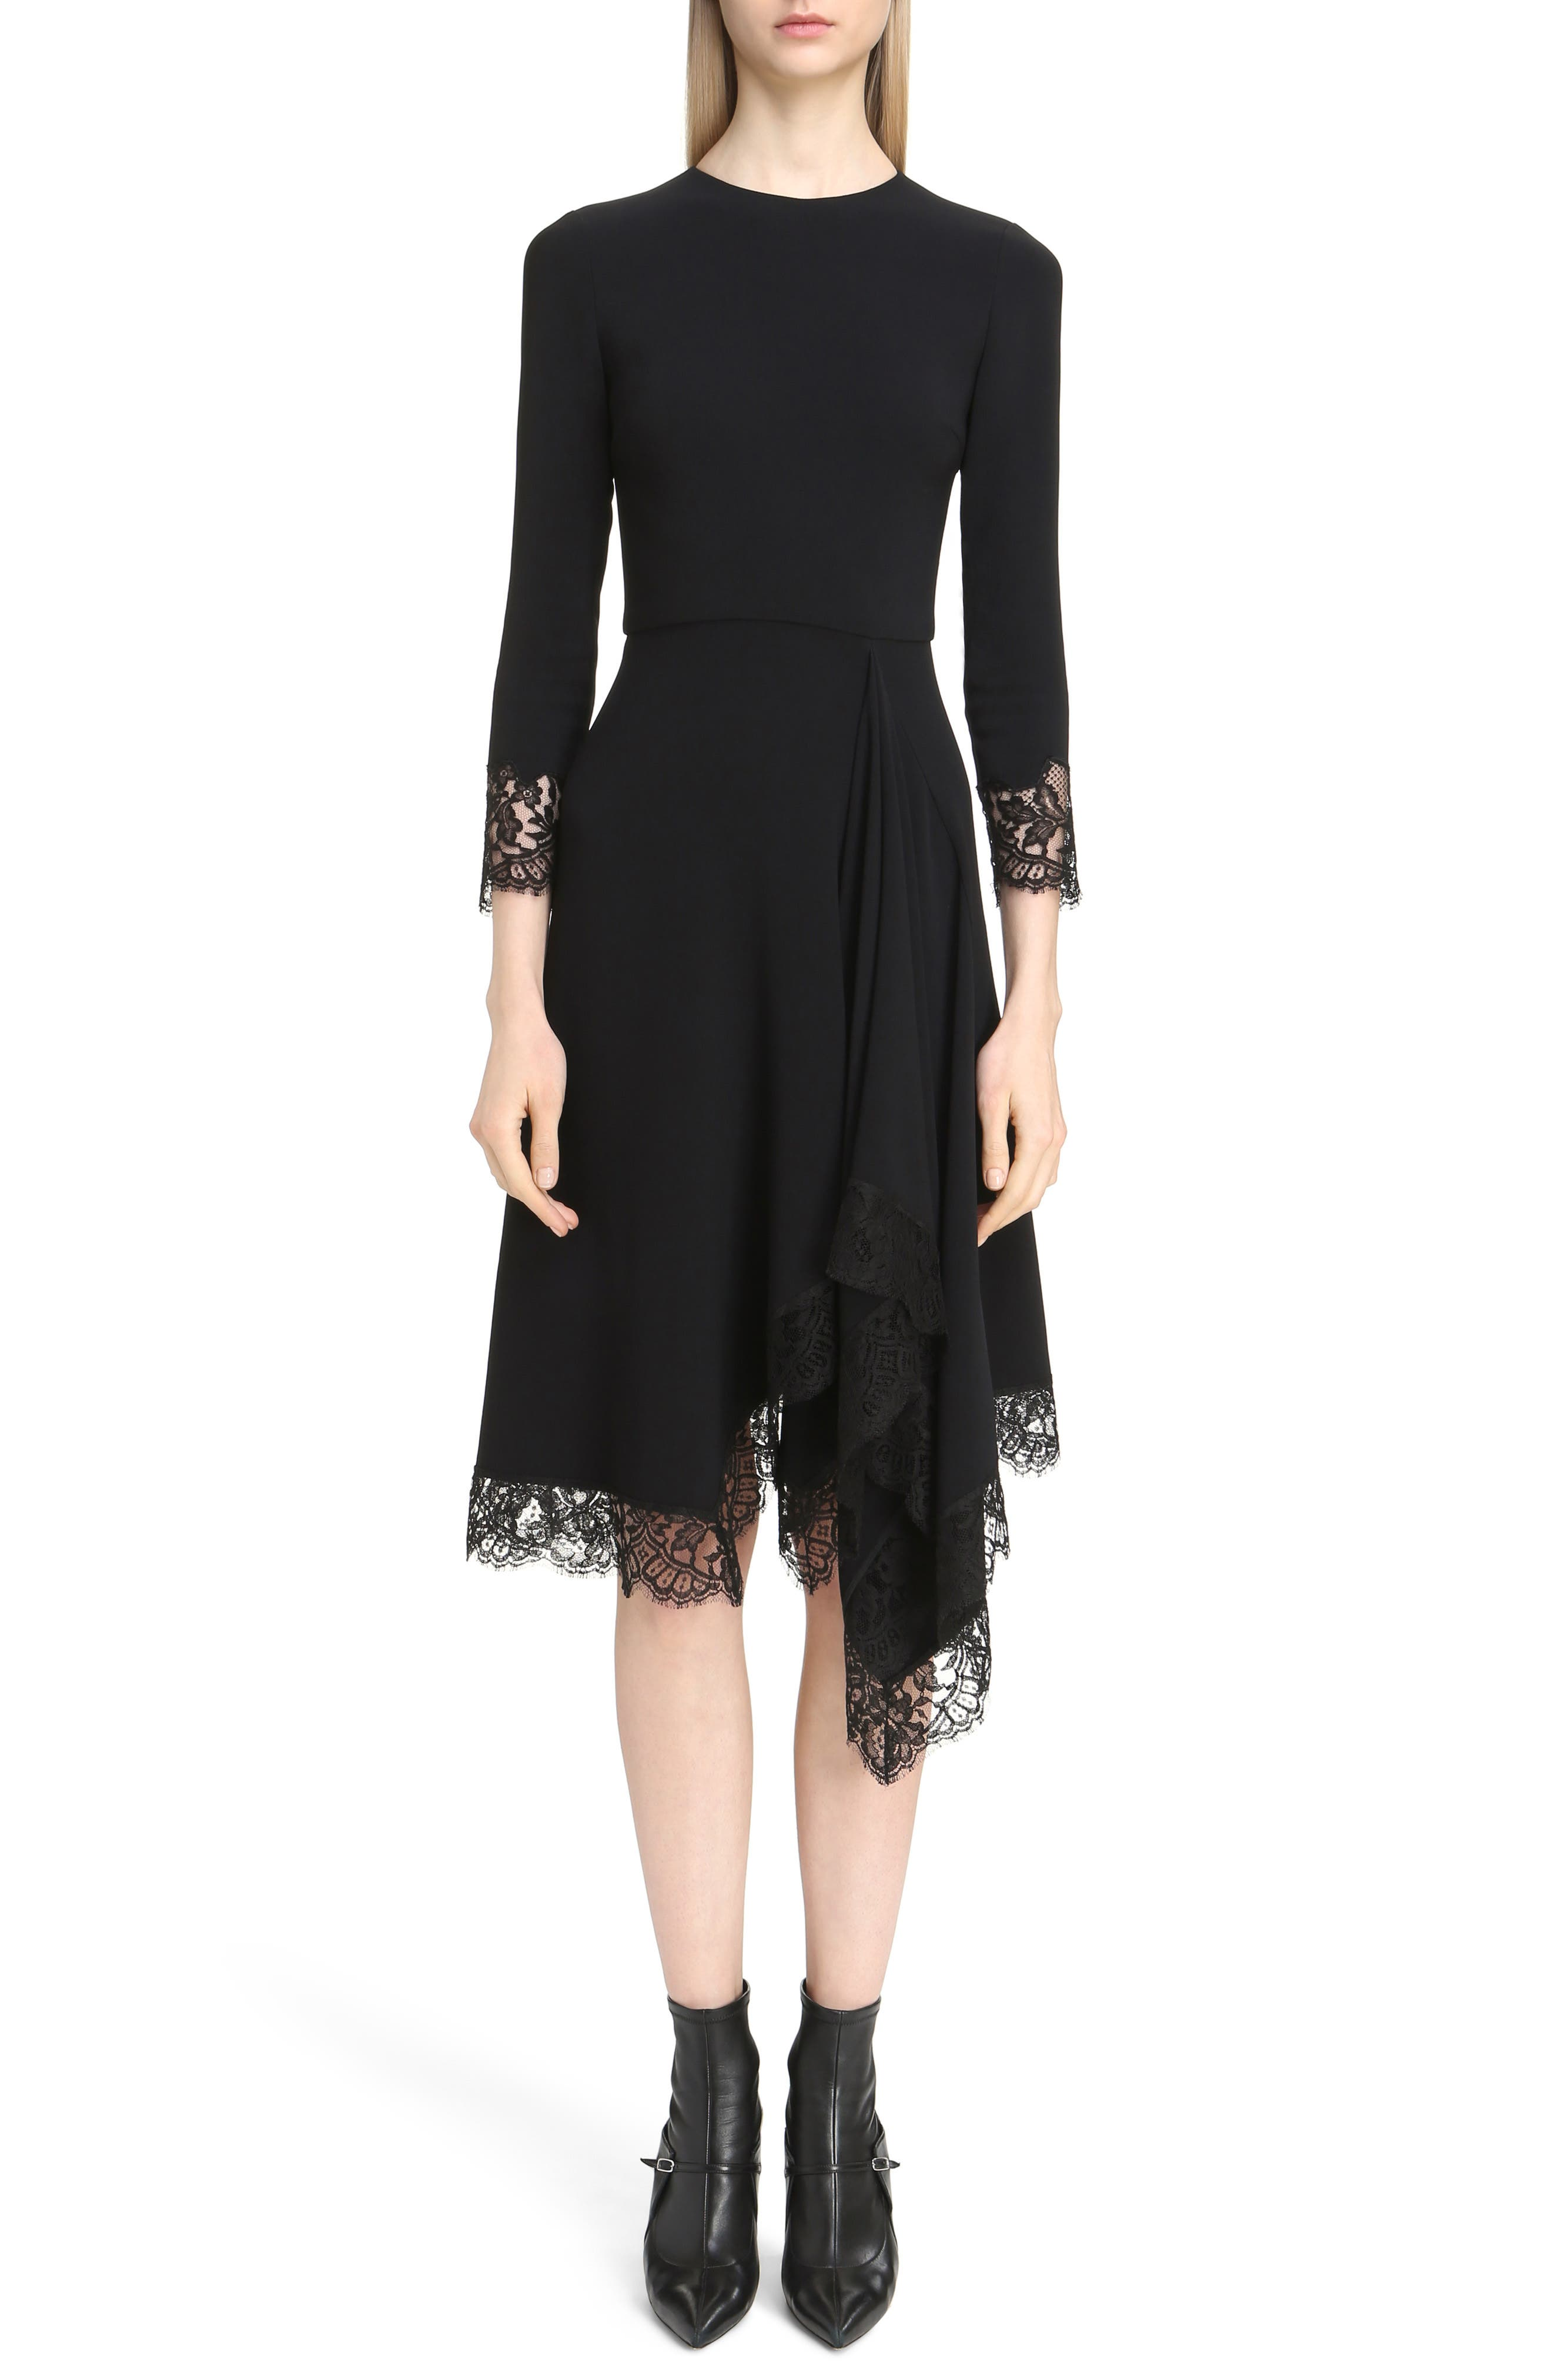 Givenchy Lace Trim Stretch Cady Asymmetrical Dress